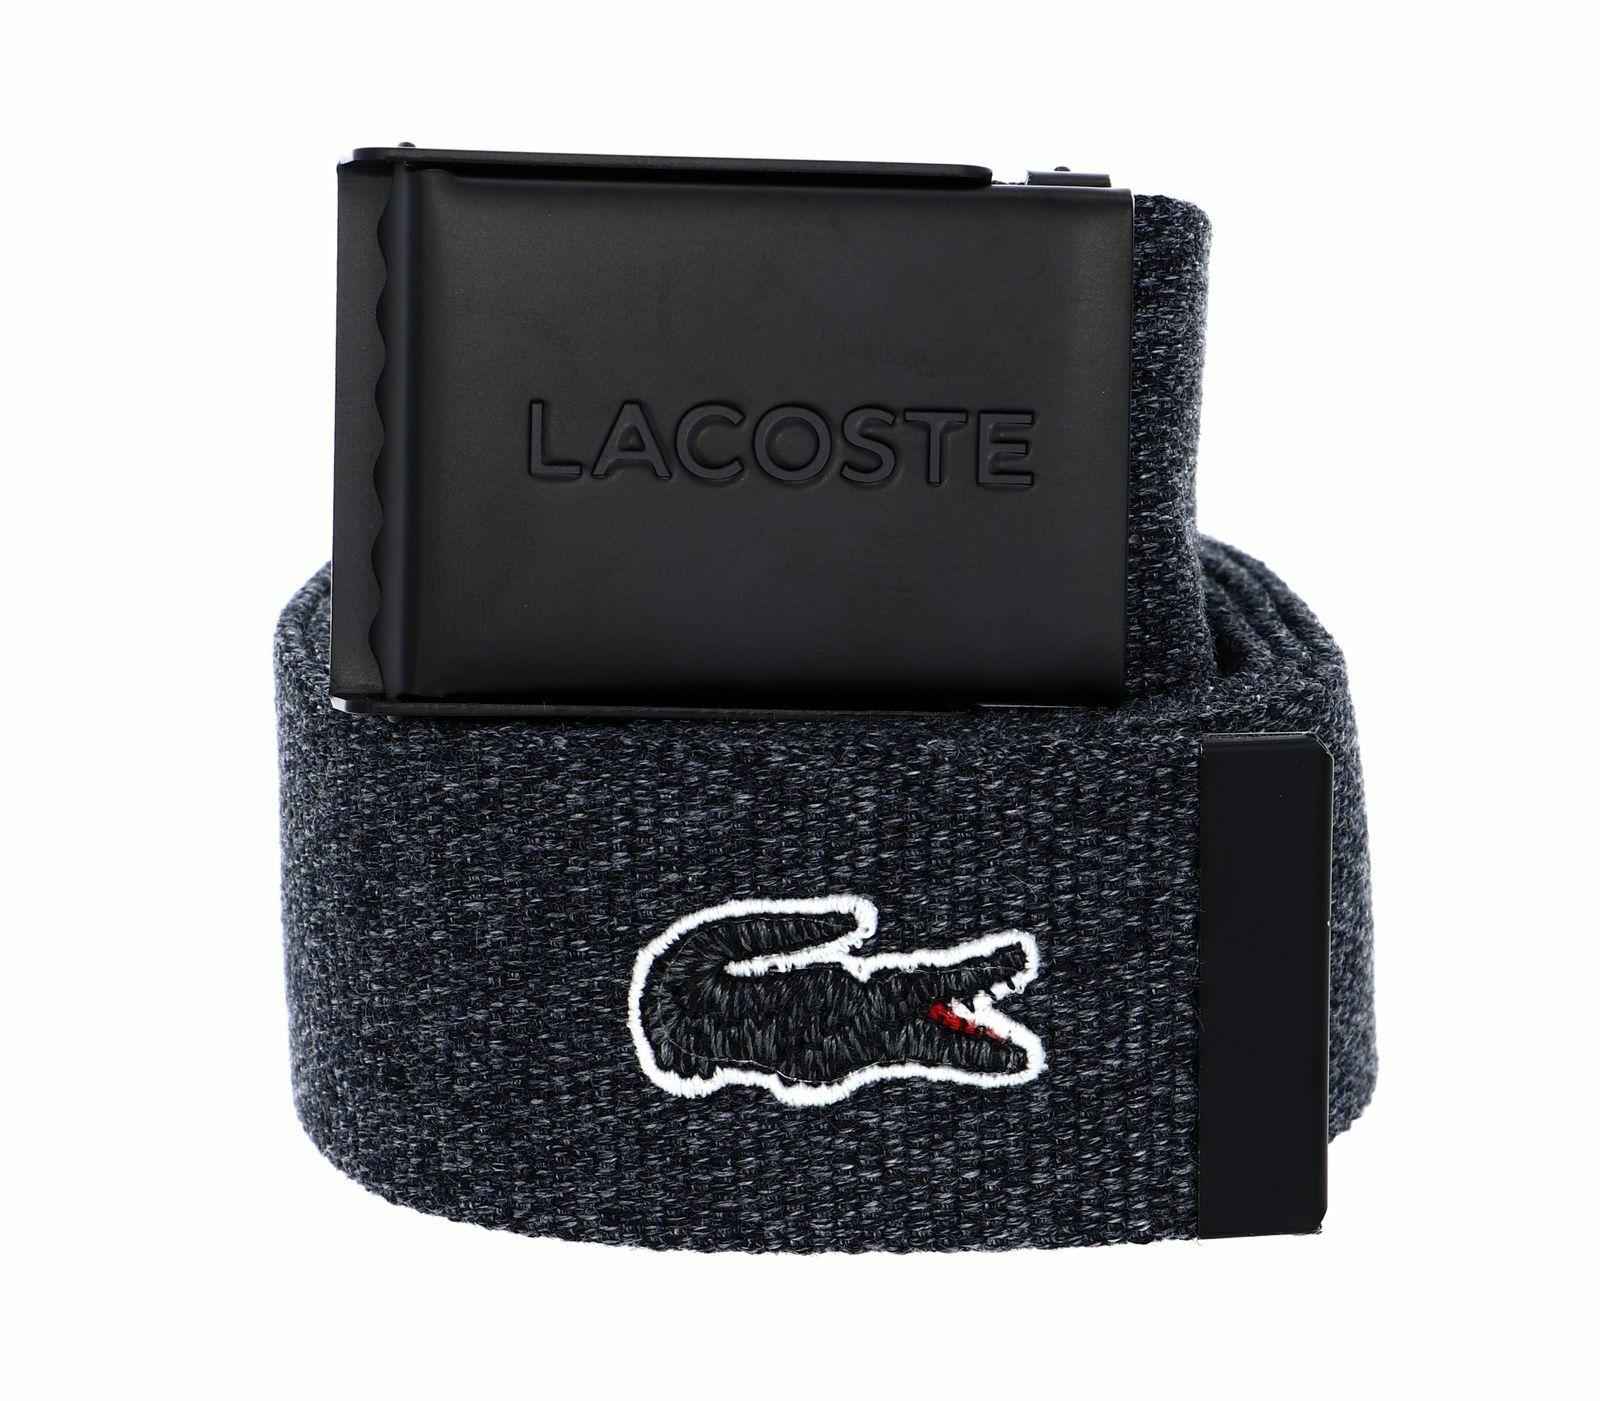 LACOSTE Woven Strap W110 Gürtel Accessoire Noir Chine Grau Neu